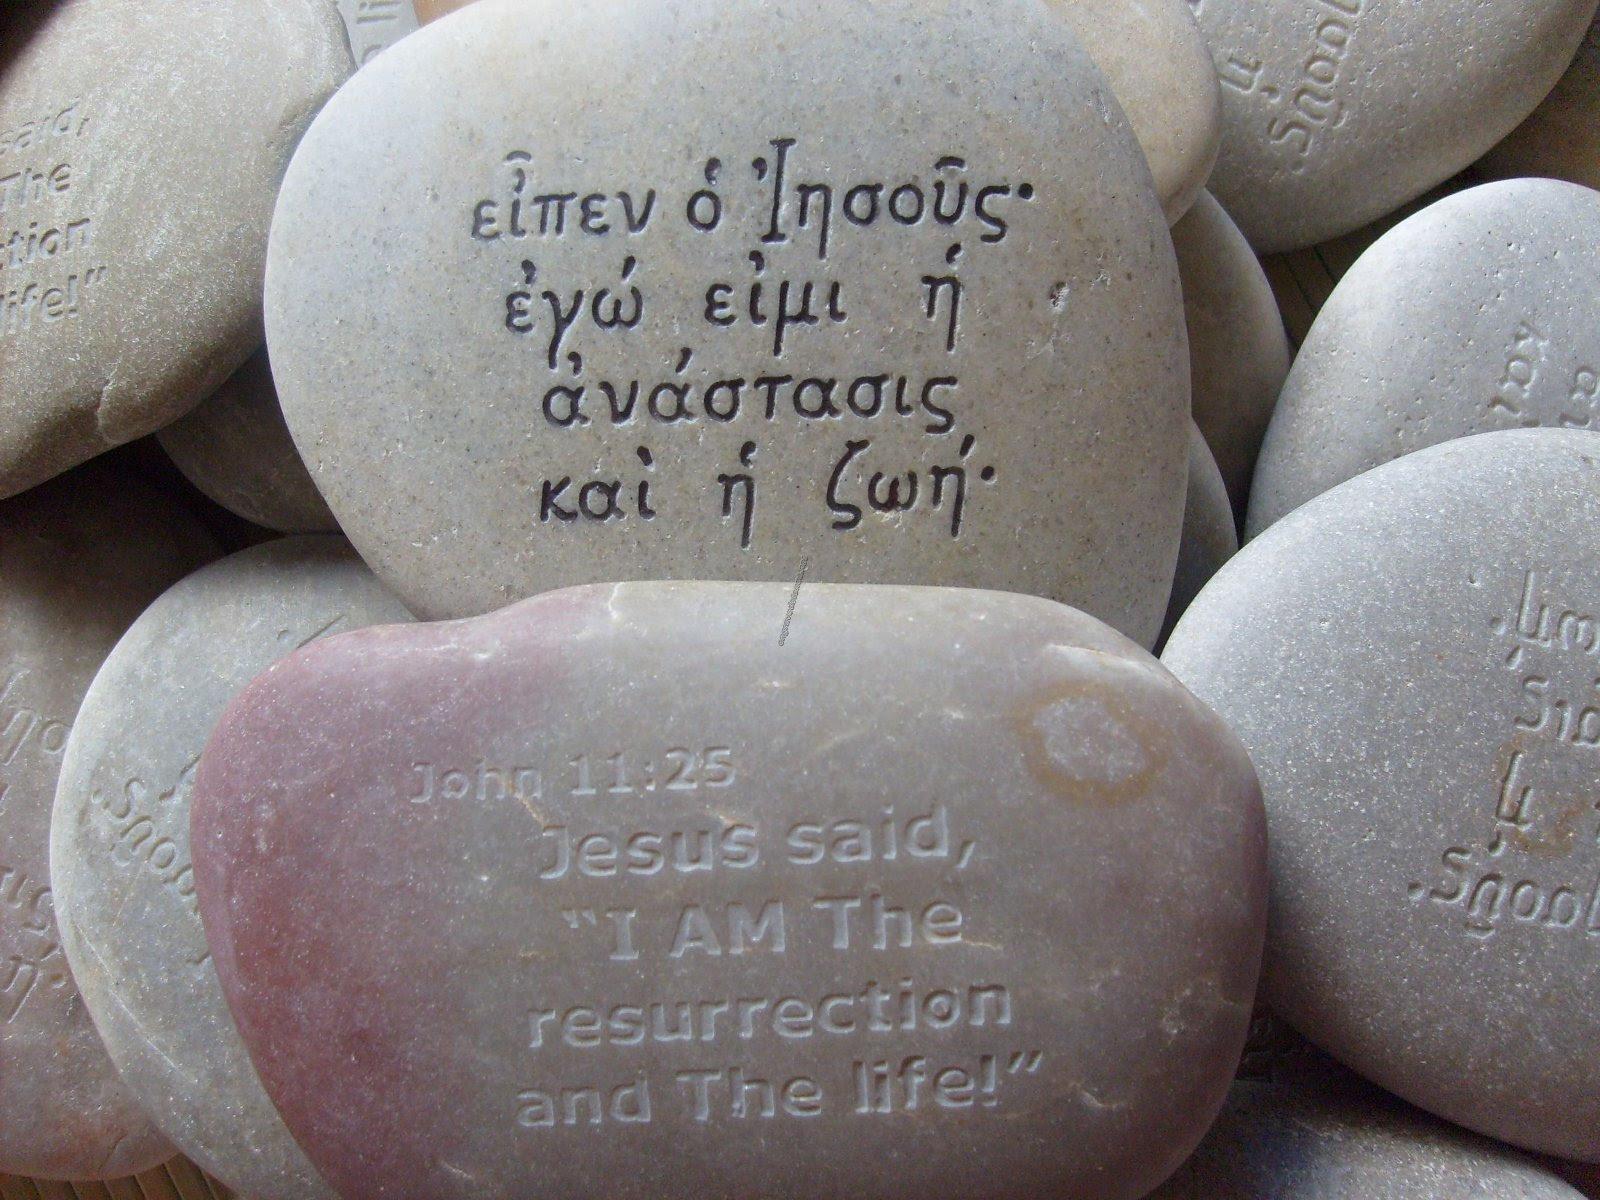 http://public.dm1.livefilestore.com/y2pVSv63eSymy0ItdqXaL2F0PhMko_TxENfyelTBdgKZgWm6VibHv7kjC2k0KDYwbbfCeCKtBe-Ov-sO-iEsIu-Cu1aqMJDFEkUopMfQ-_PCNQ/stones-large.jpg?rdrts=63916970